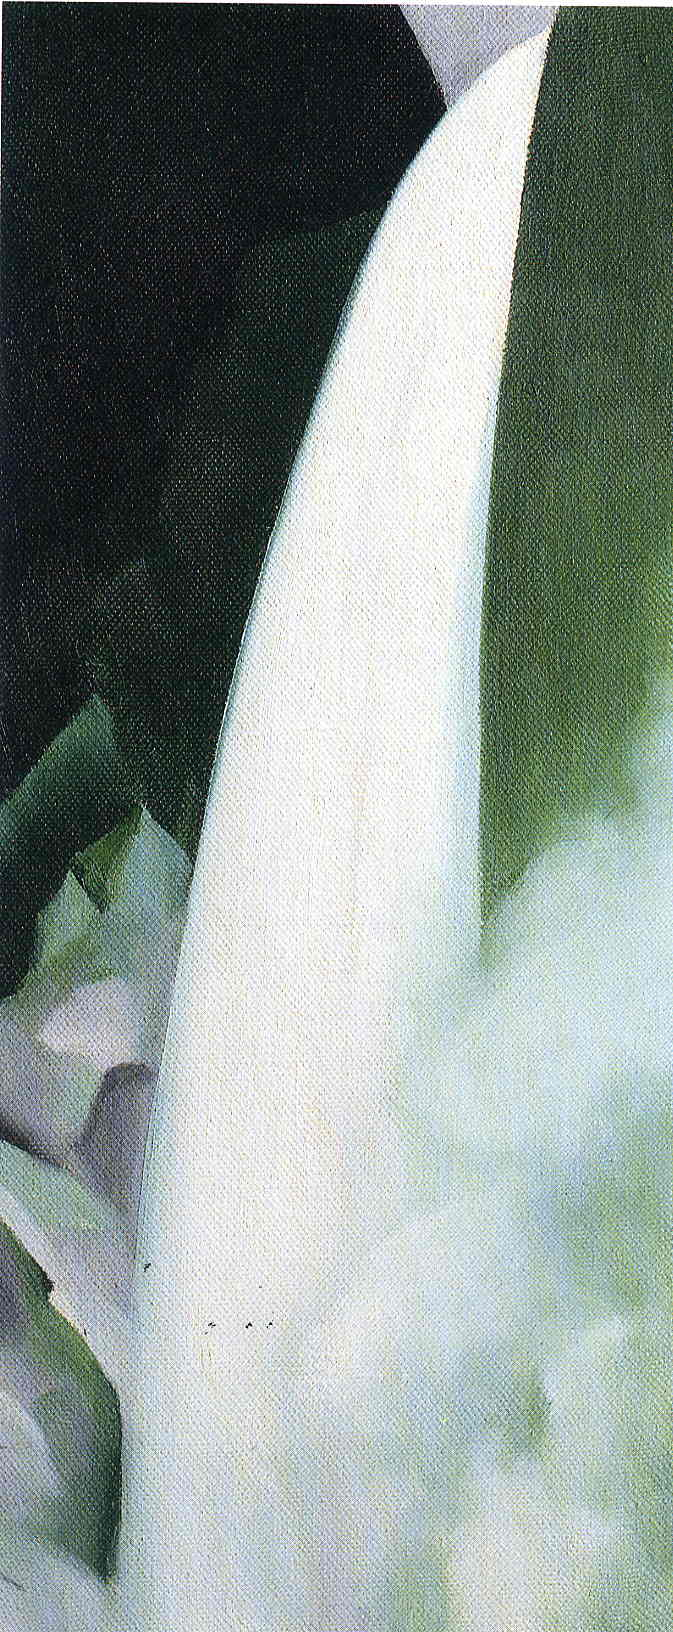 Green and White, Georgia O'Keeffe